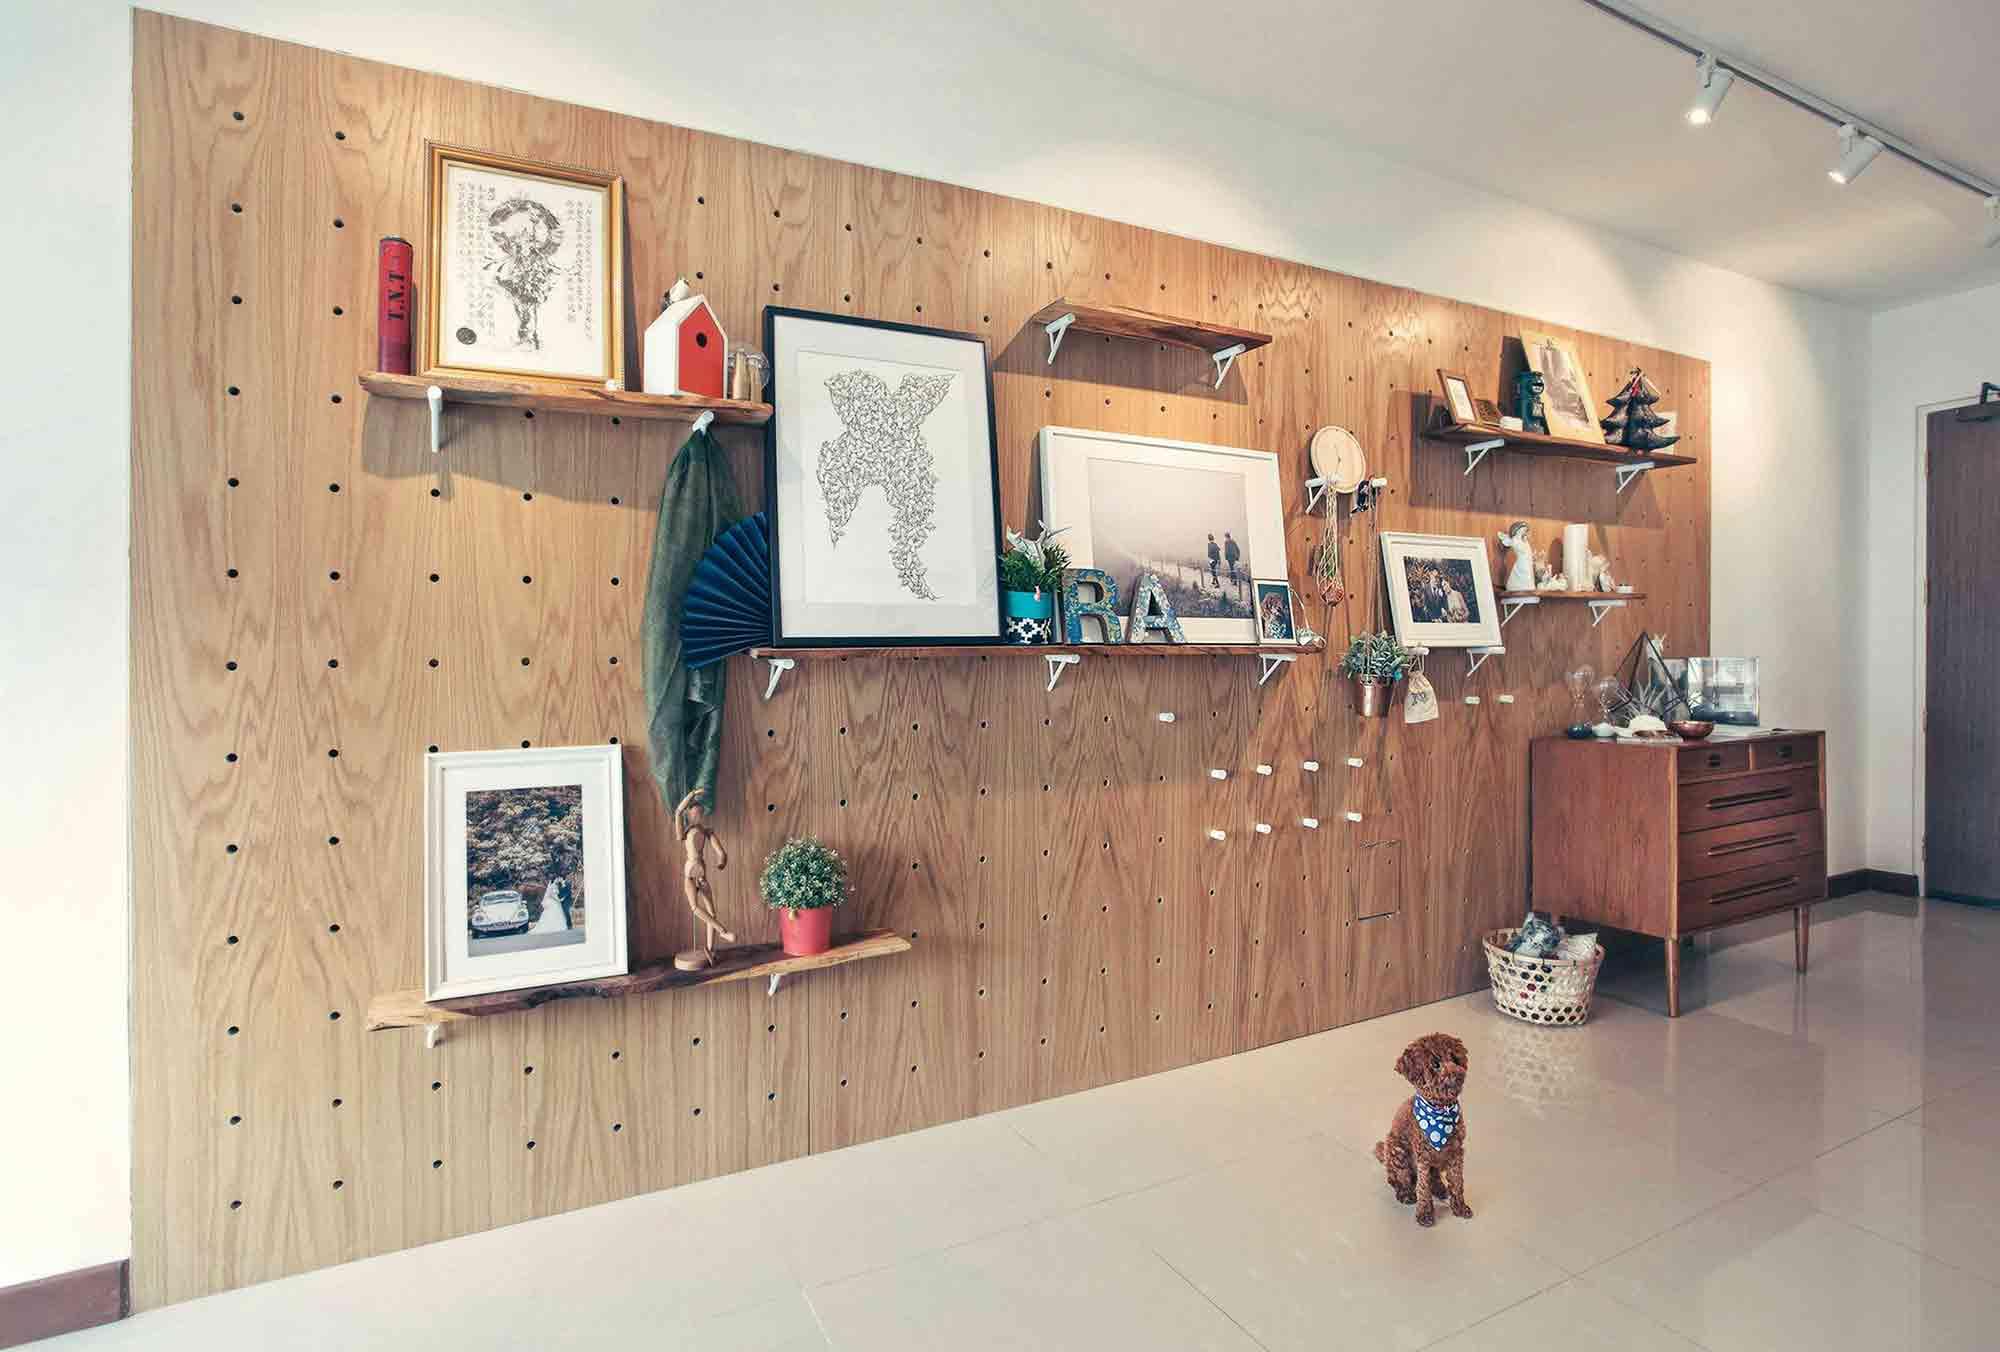 Rak dinding modular karya HelloEmbryo, via arsitag.com